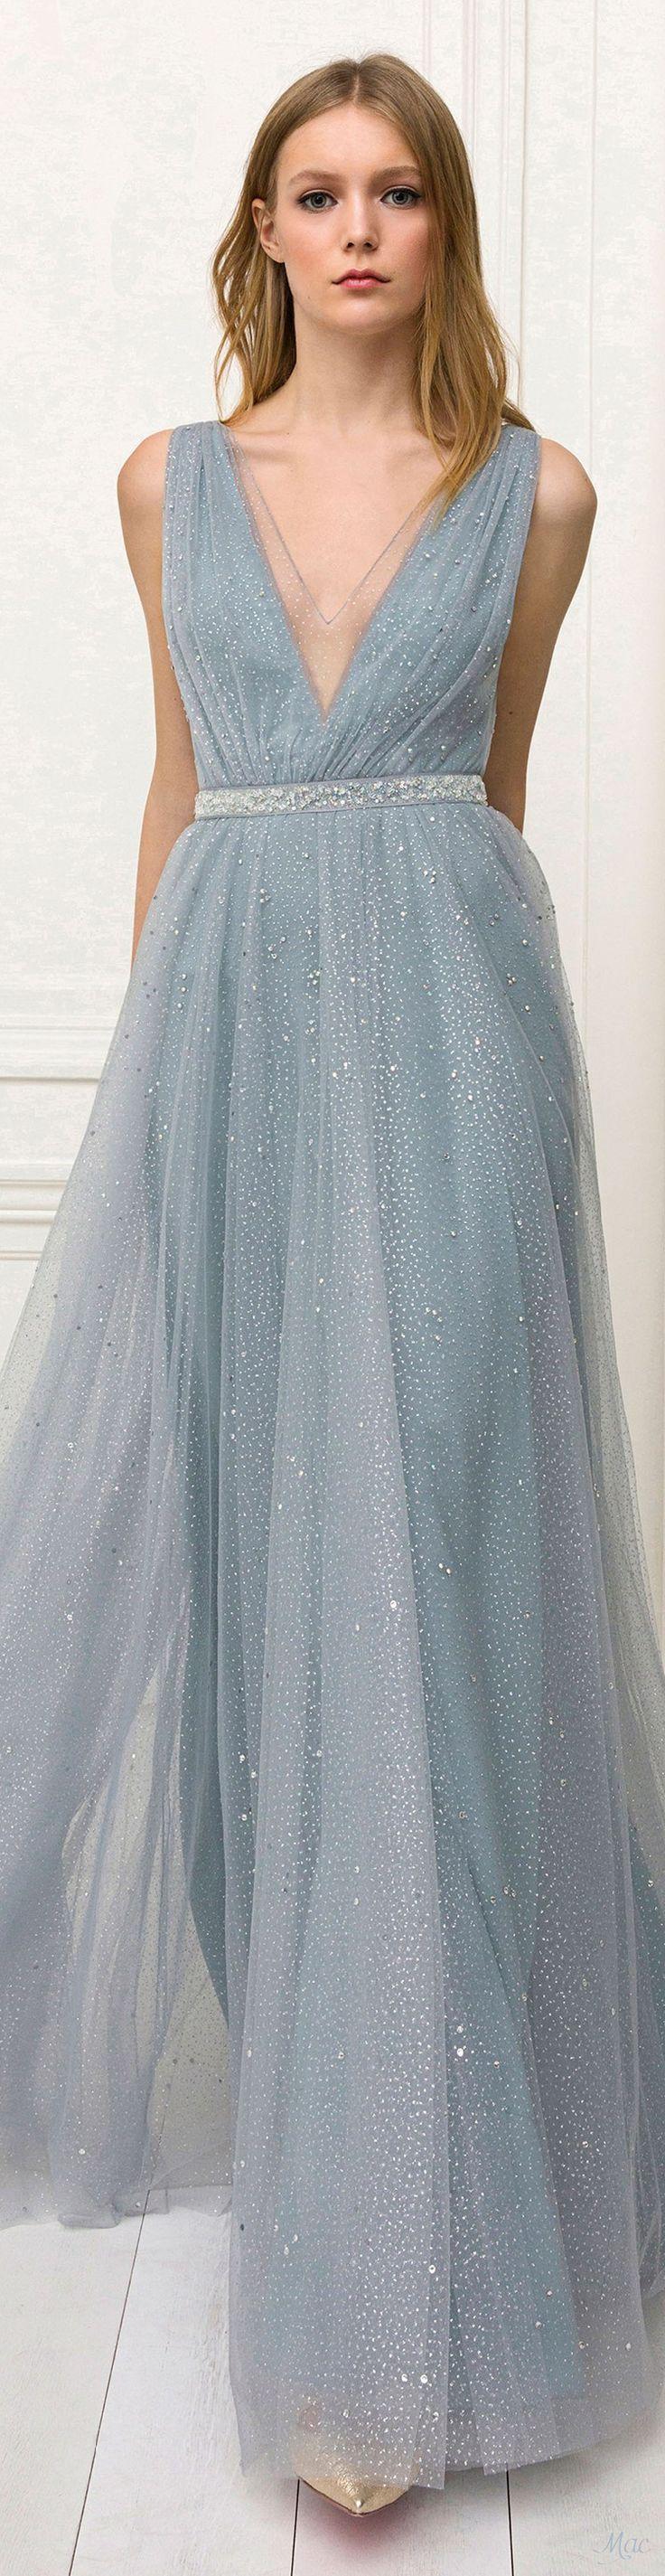 377 best JENNY PACKHAM BRIDE images on Pinterest | Wedding frocks ...